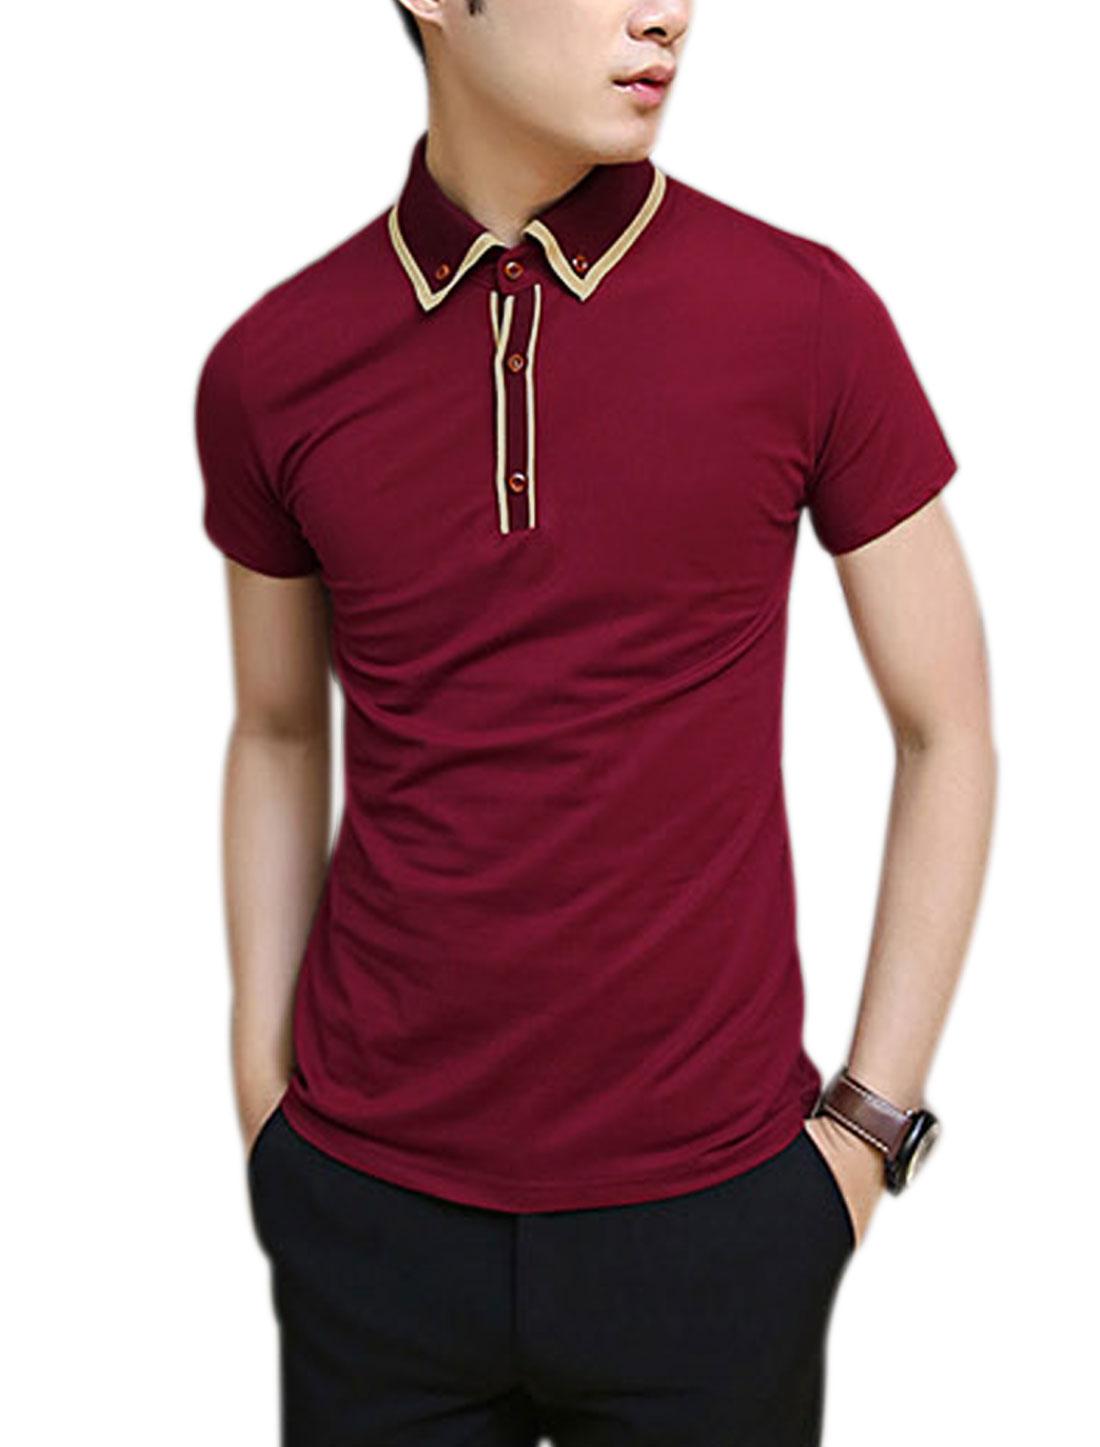 Men Rib Knit Point Collar 1/4 Placket Slim Fit Polo Shirt Burgundy M